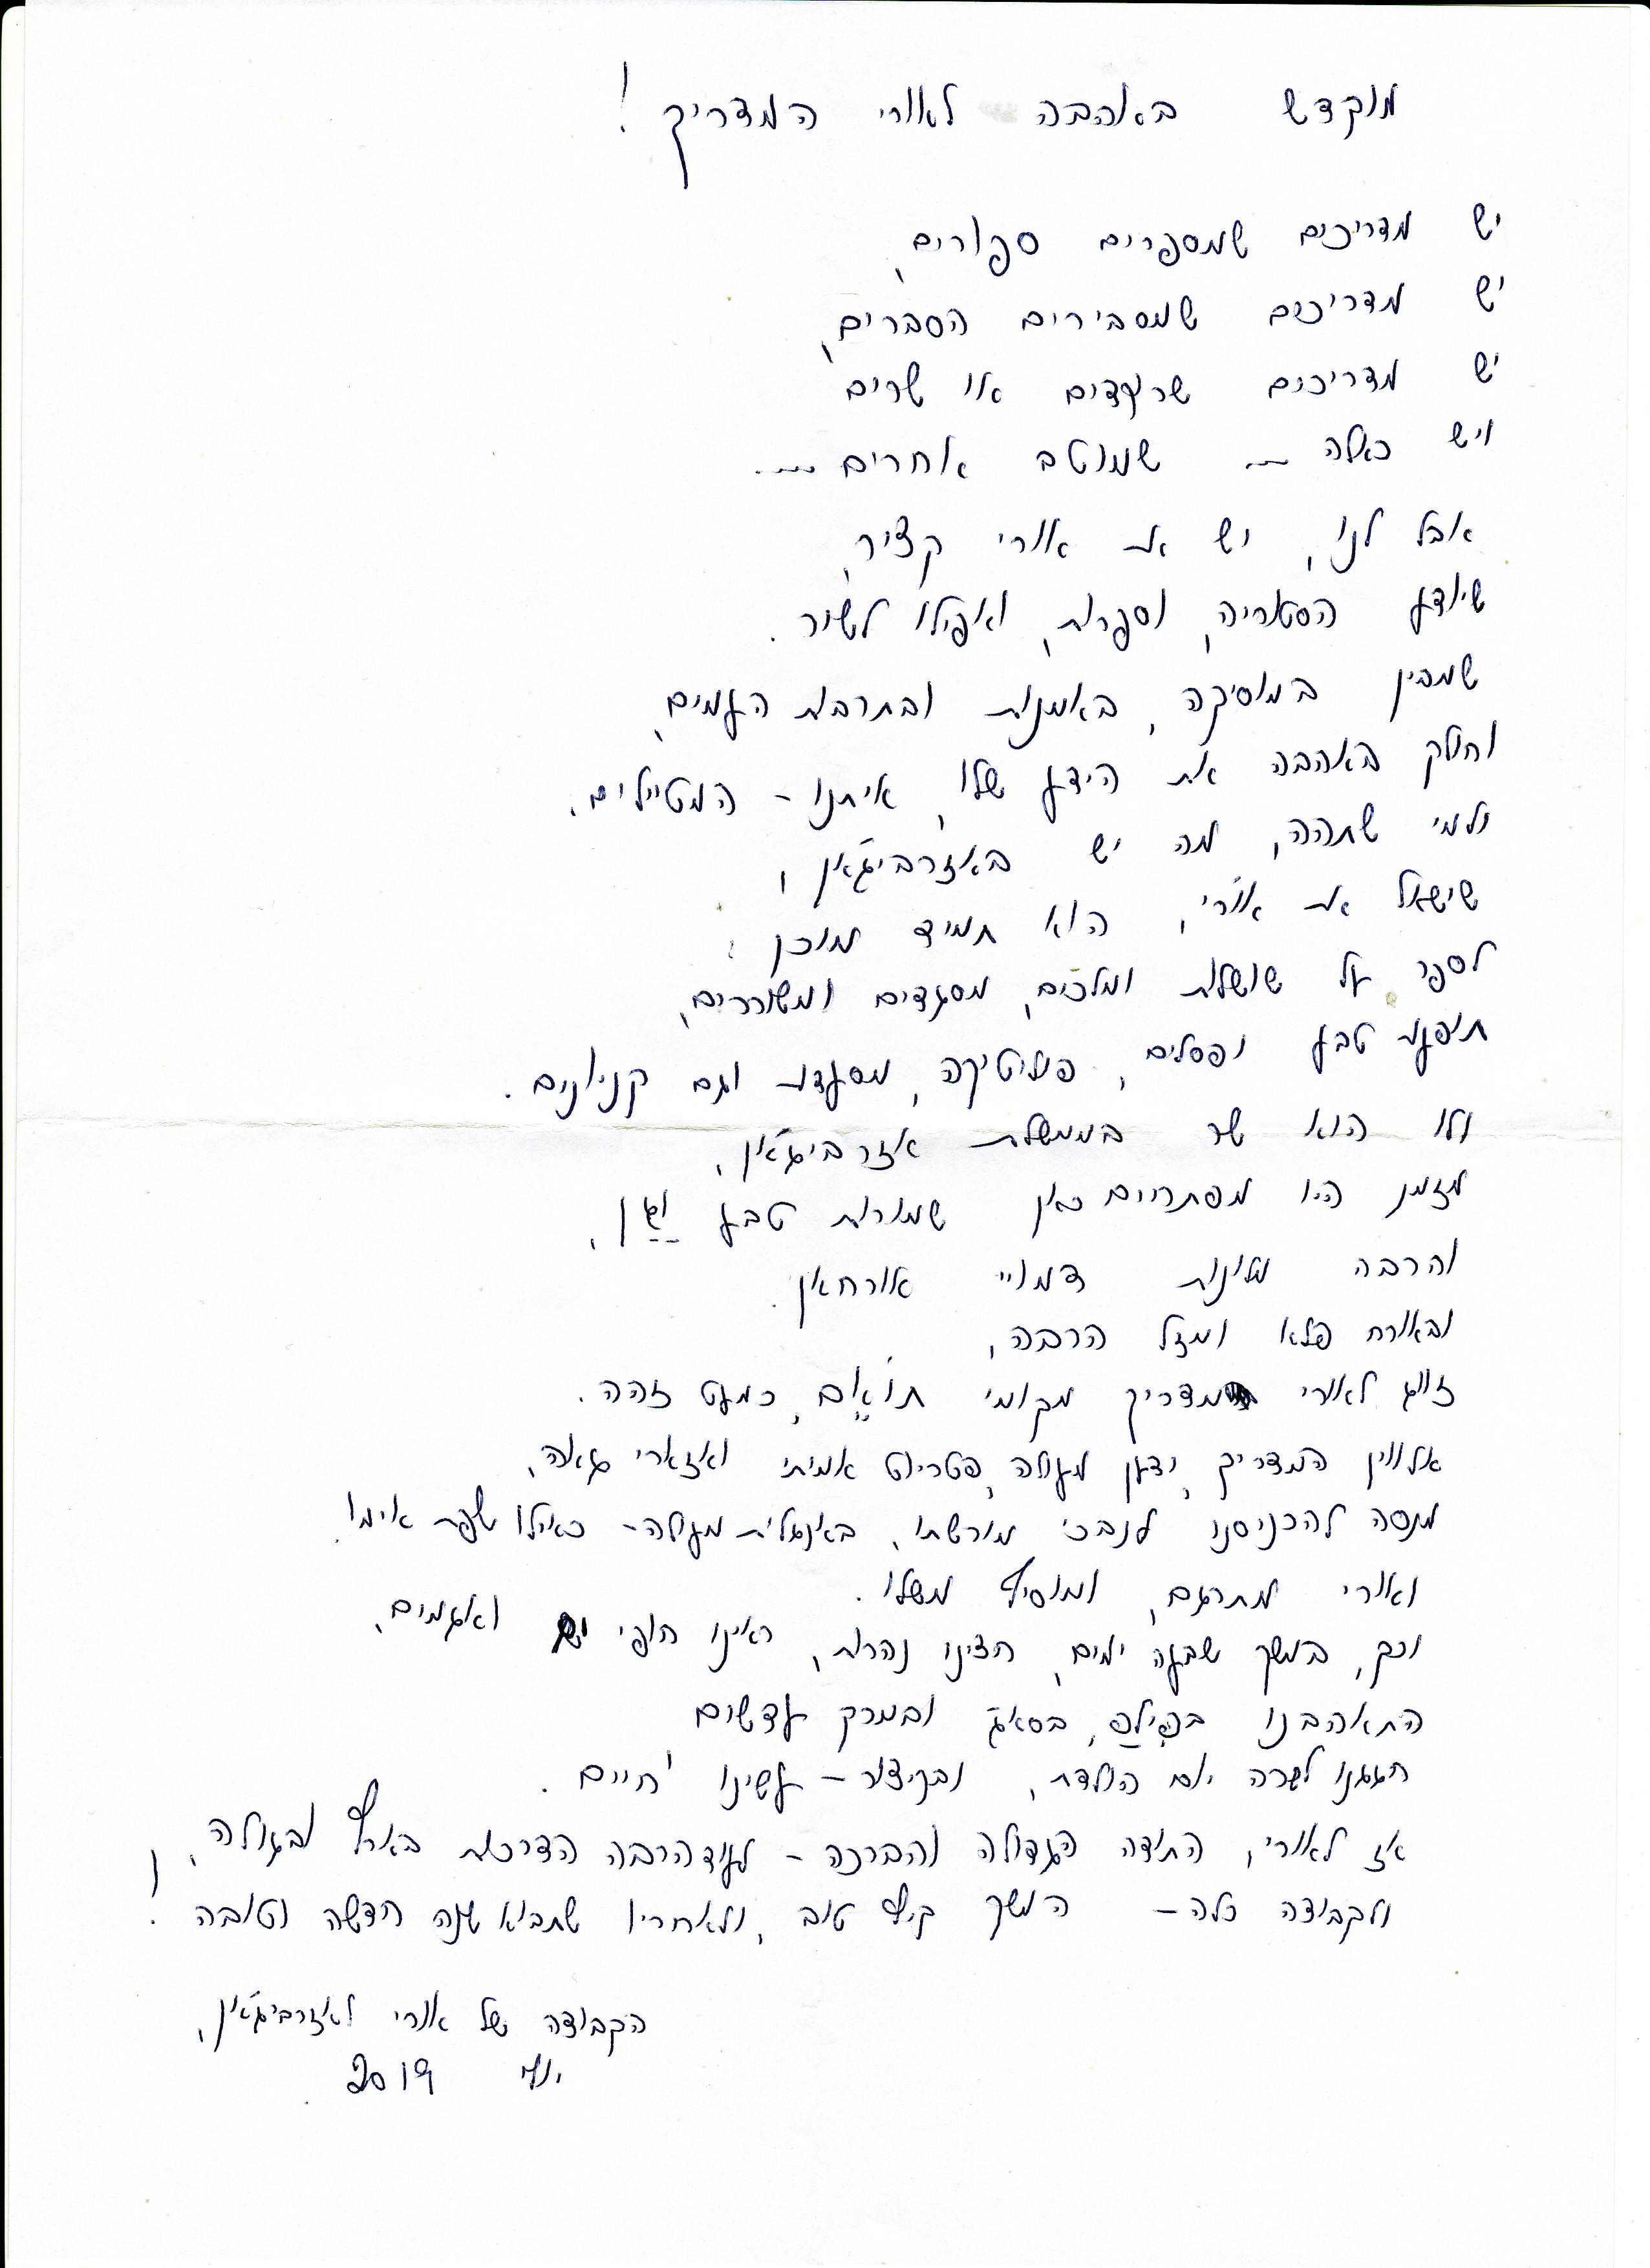 אורי קציר, אזרבייג'ן 7/2019